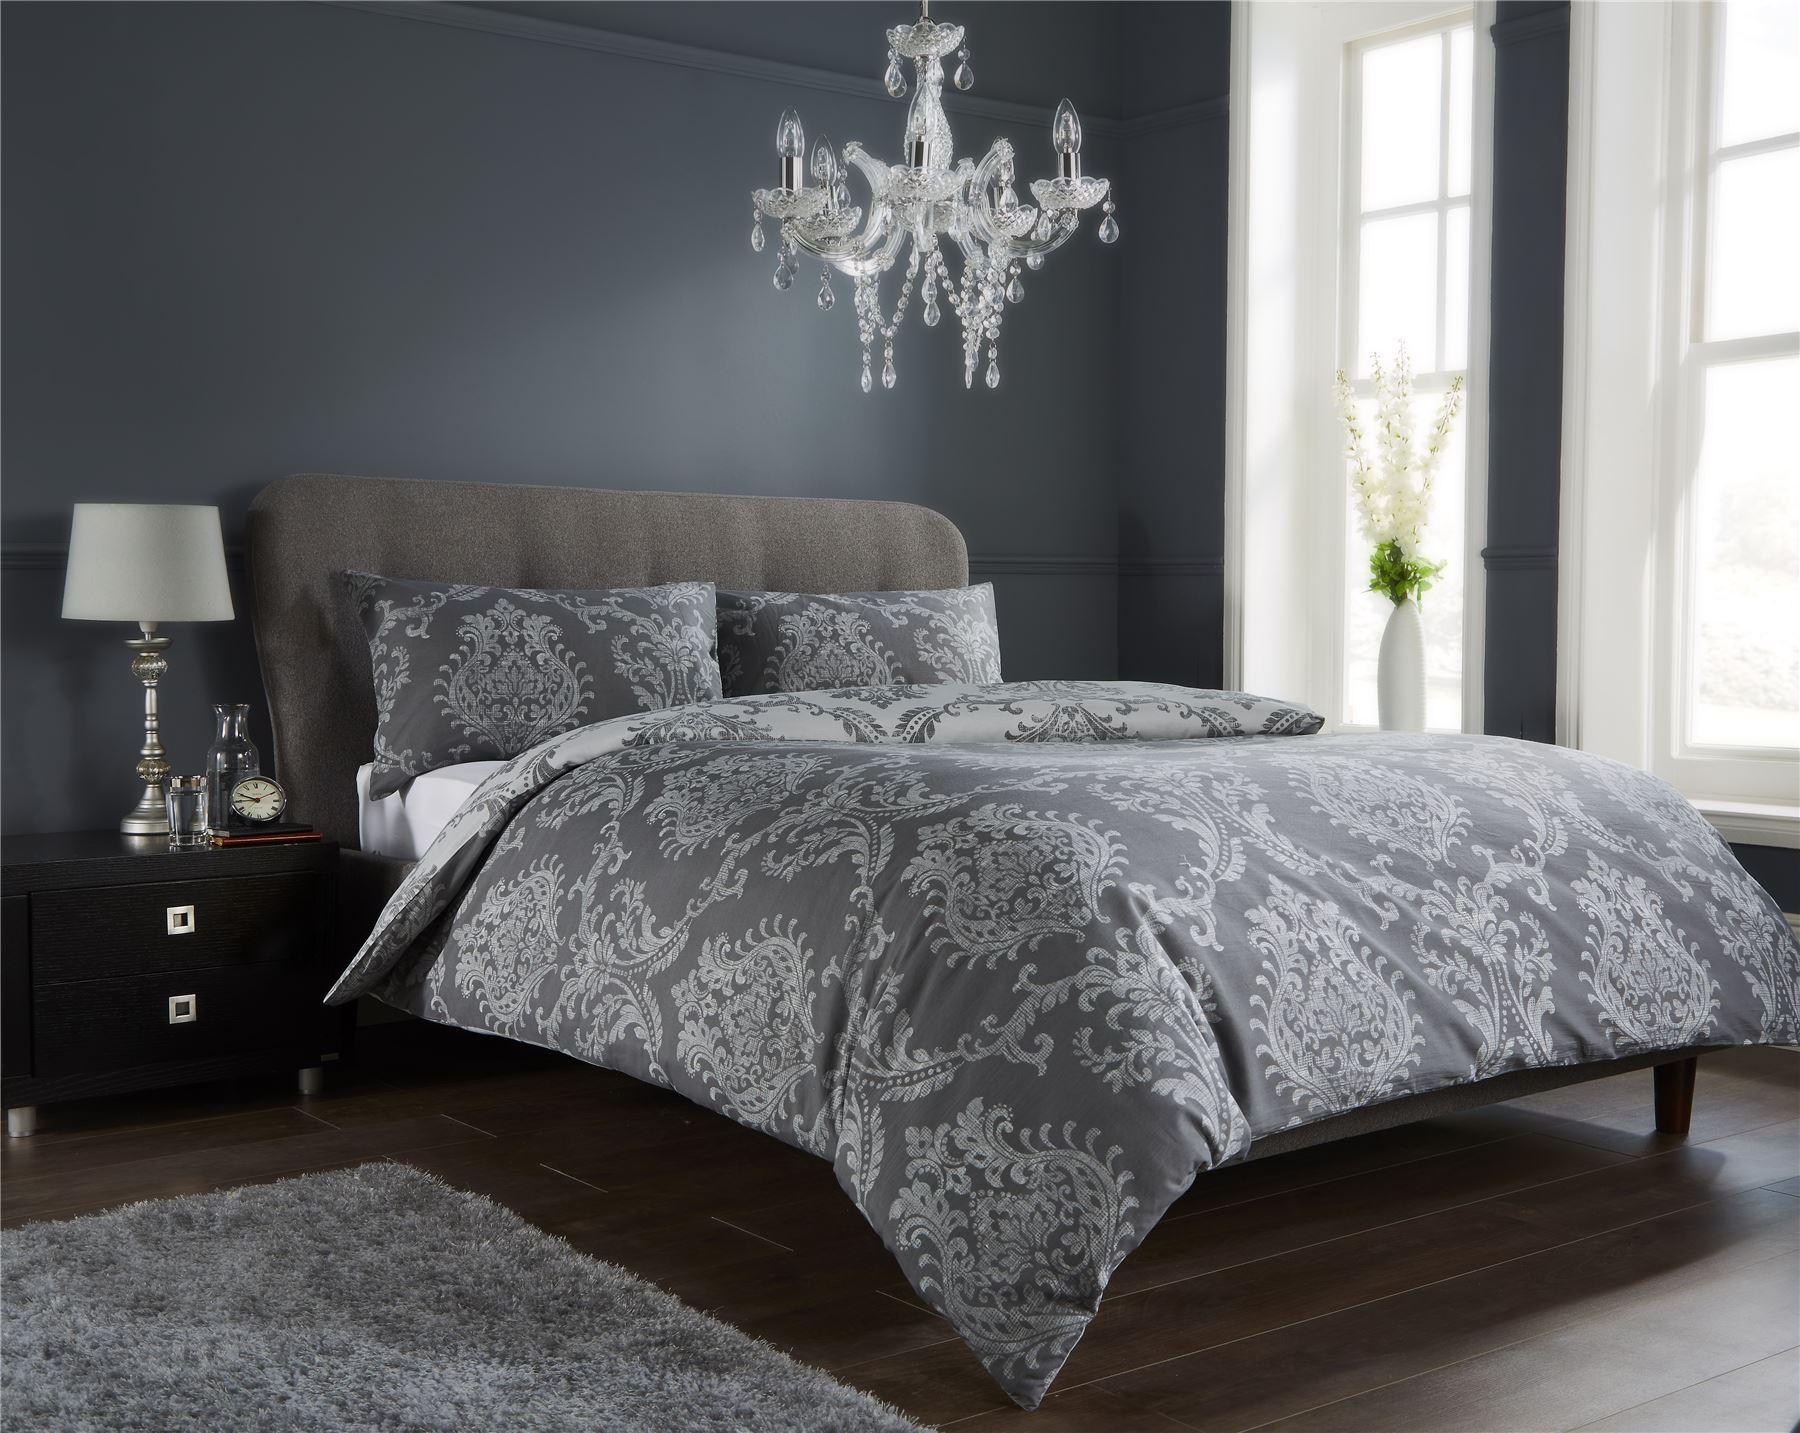 Damask Duvet Quilt Cover Set, Bed Linen Double King Size